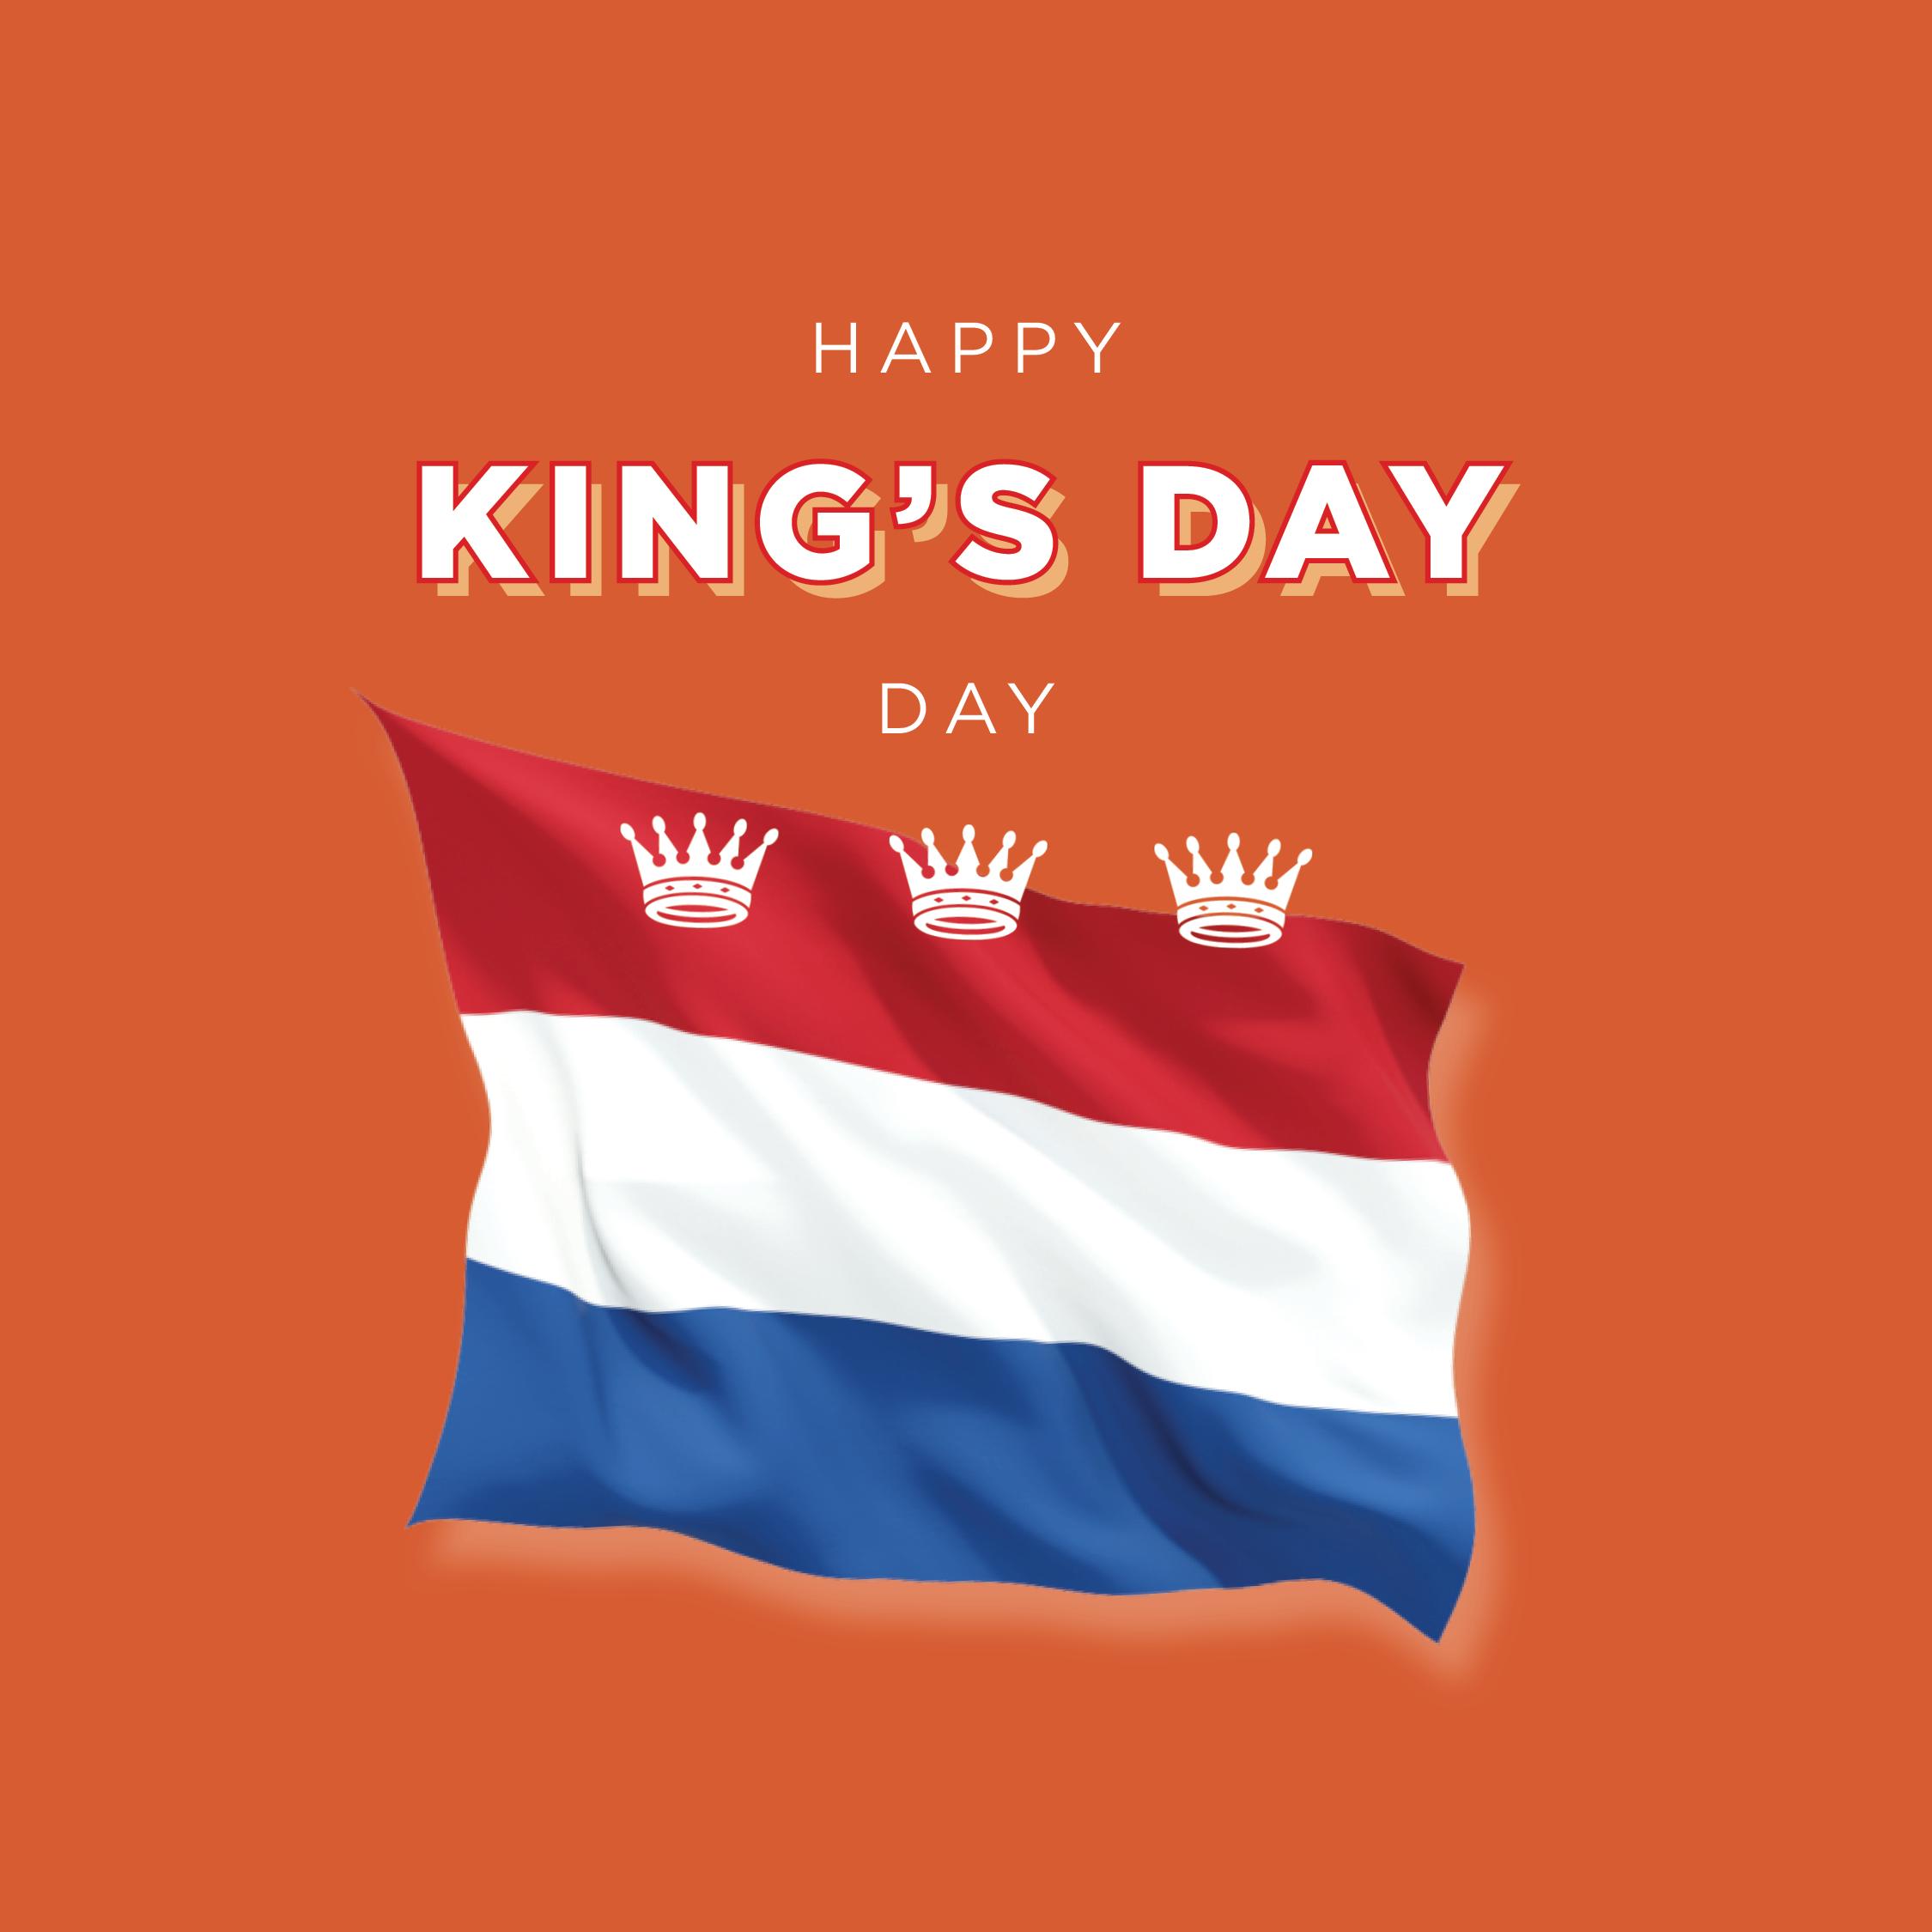 Template_NationalDays_KingsDay2020